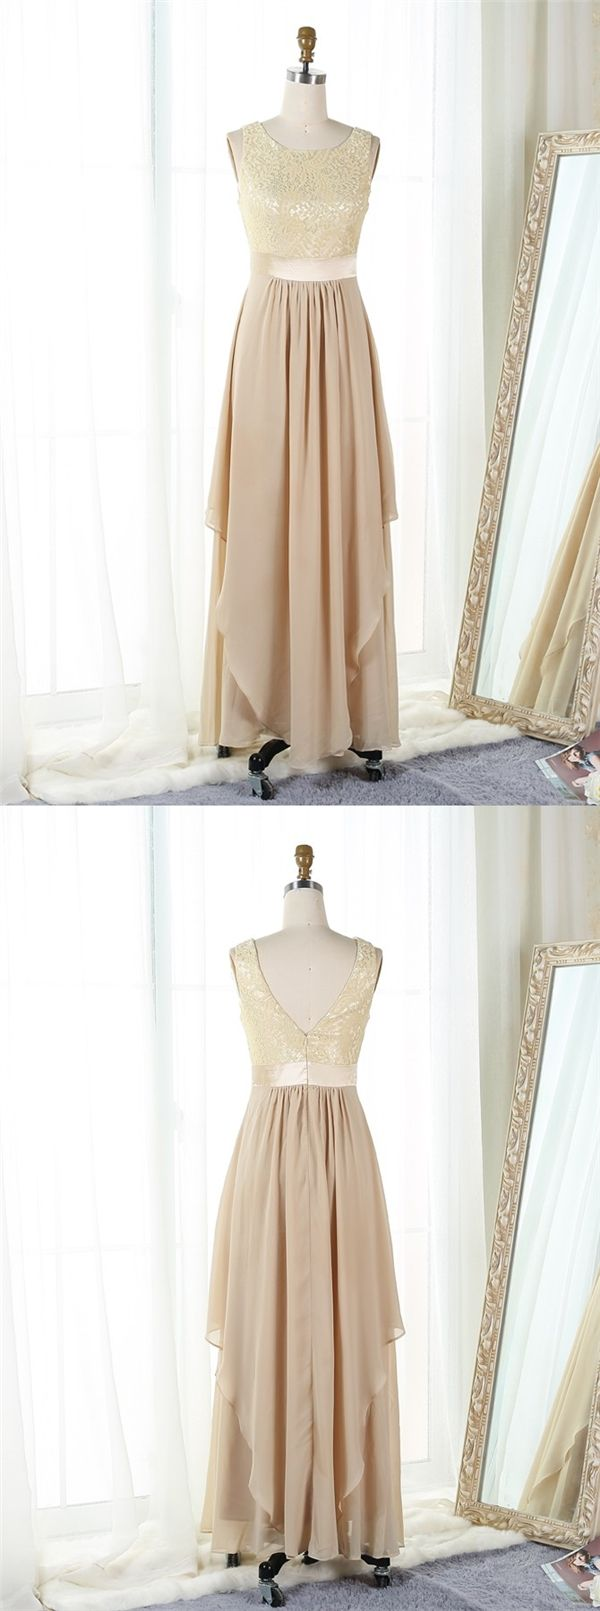 Aline bateau floorlength champagne chiffon prom dress with lace